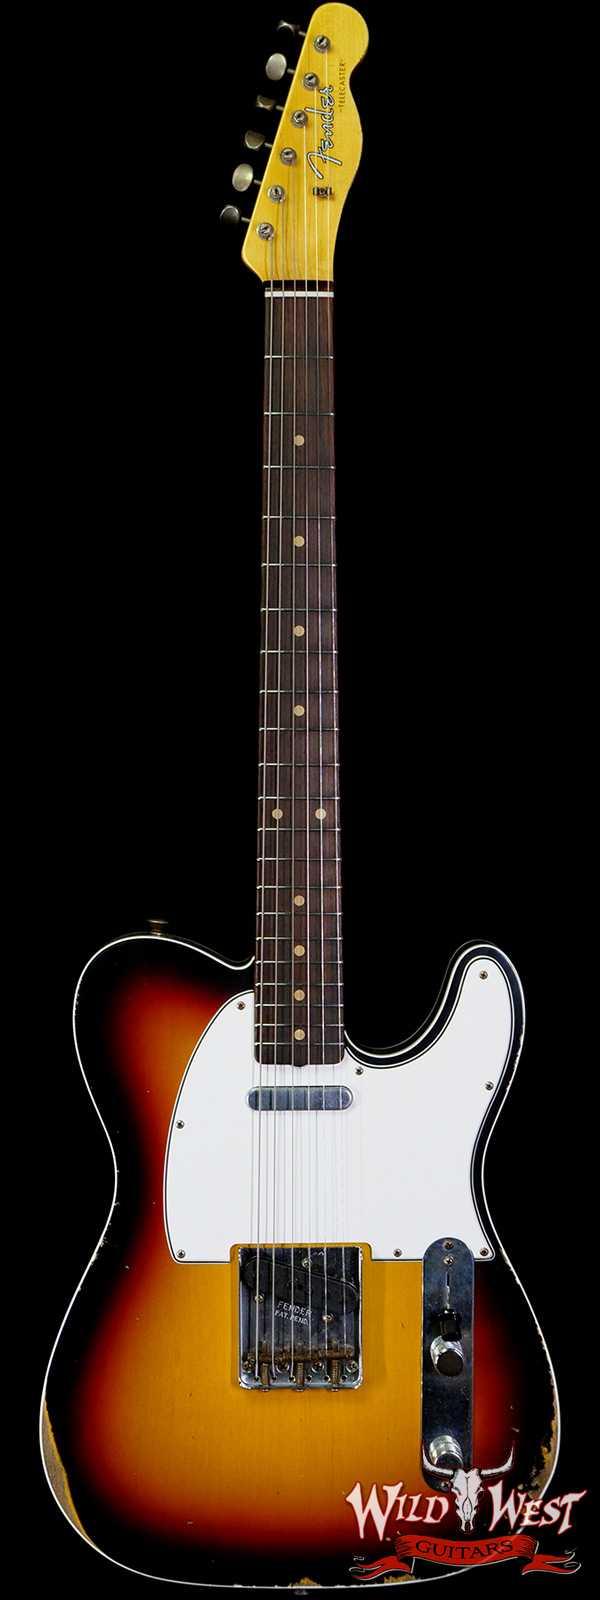 Fender Custom Shop 1960 Telecaster Custom Relic Quater-Sawn Maple AAA Rosewood Fingerboard 3 Tone Sunburst